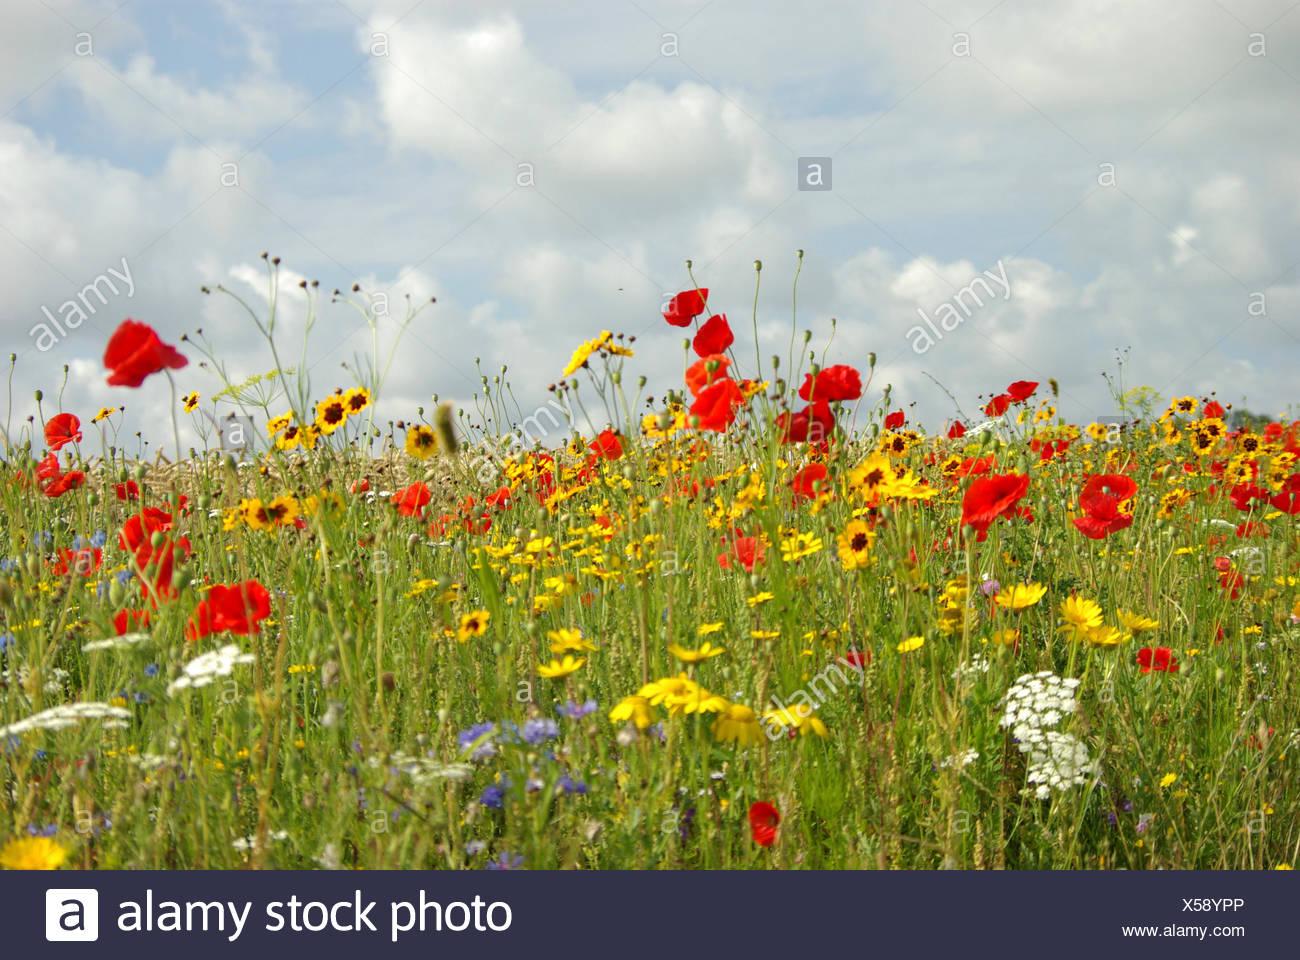 Cornflower like purple flowers stock photos cornflower like purple a meadow with different kinds of wild flowers like poppies german chamomile cornflower and mightylinksfo